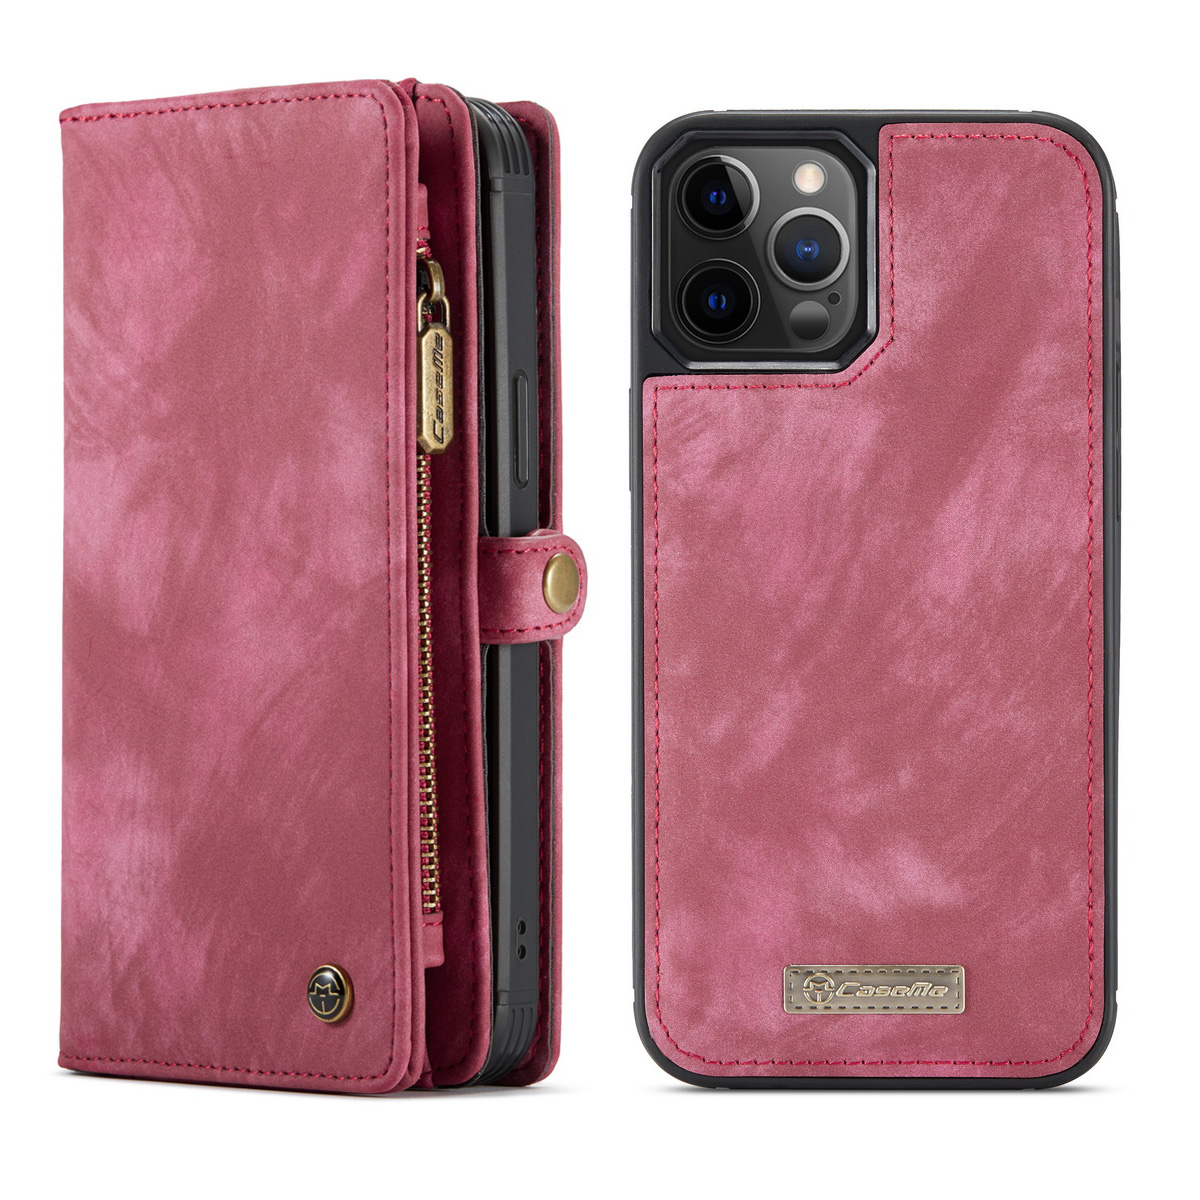 CaseMe 008 Series läderfodral, iPhone 12/12 Pro, röd